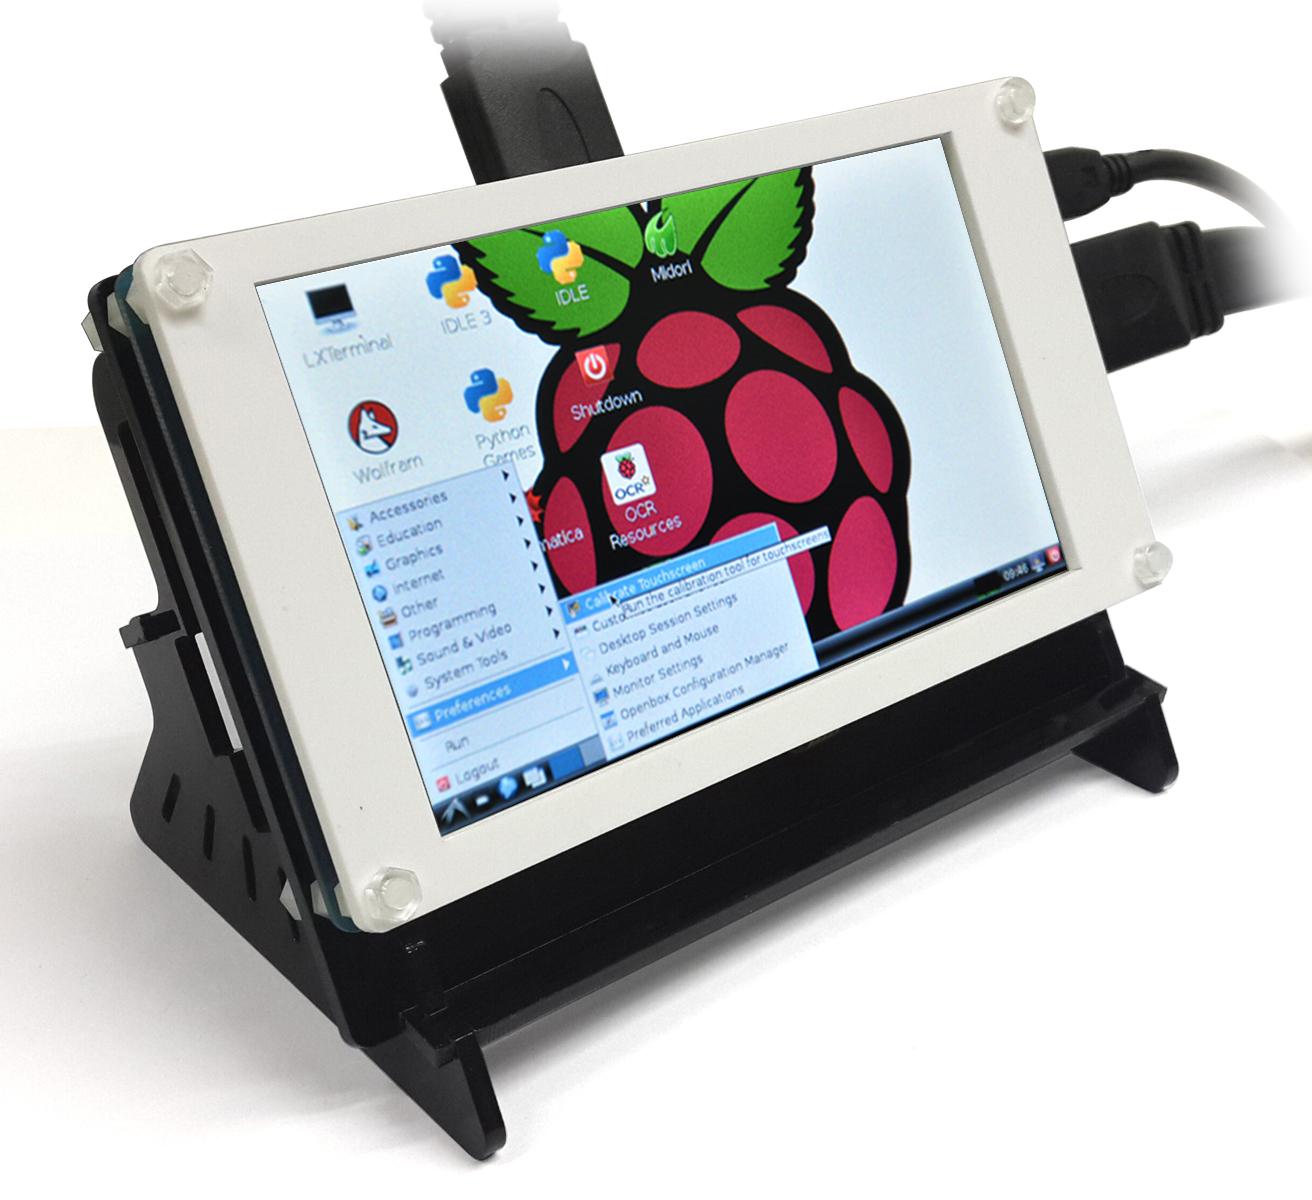 5 Inch 480 *800 HDMI Input Touch Screen for Raspberry PI 3 2B B+ and Banana  Pro/Pi Beaglebone Black